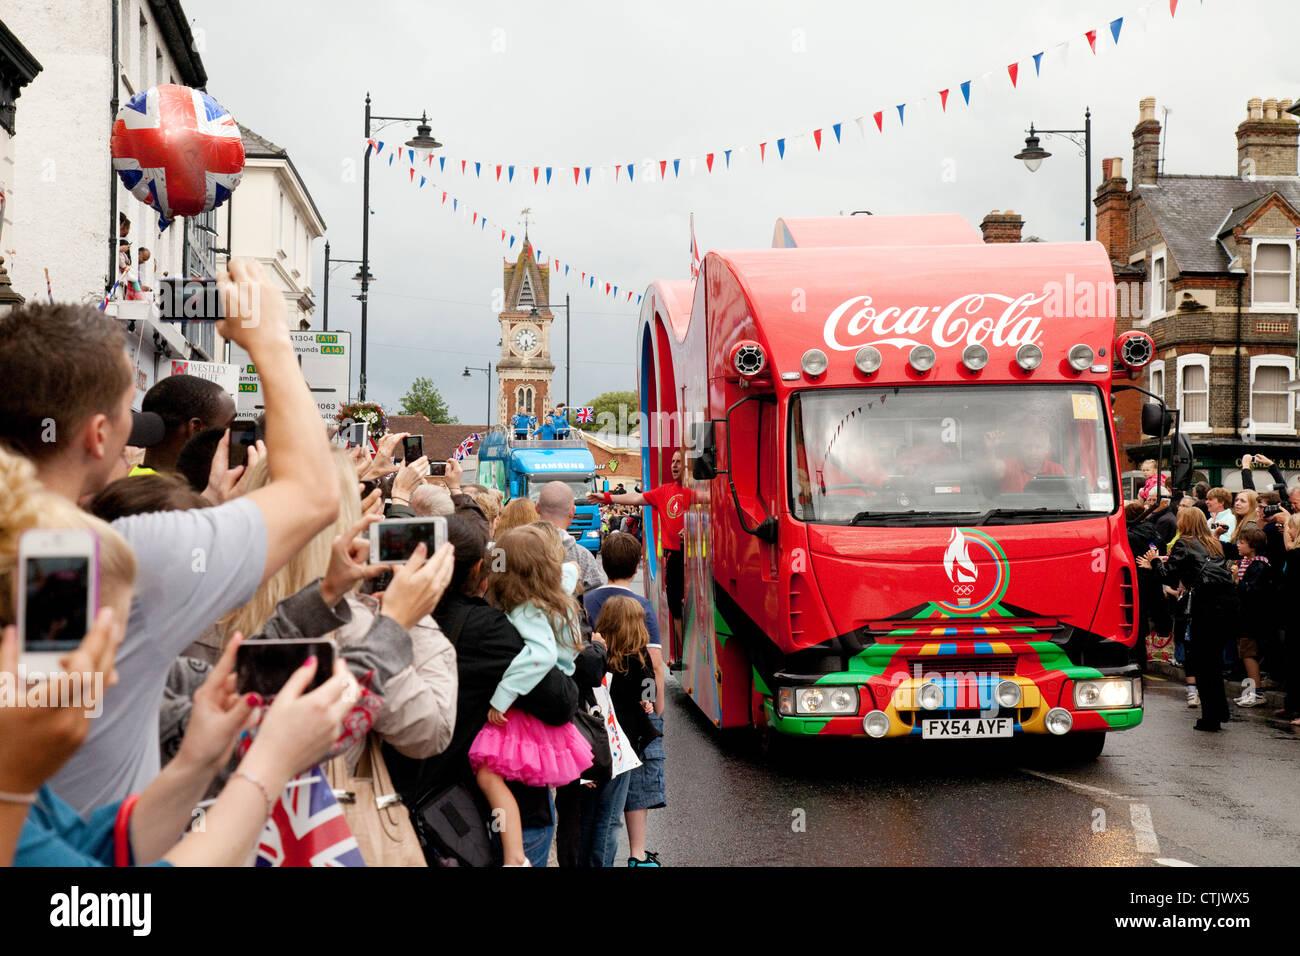 Coca cola 2012 camion sponsor olympique Relais de la flamme à Newmarket Suffolk East Anglia UK Photo Stock